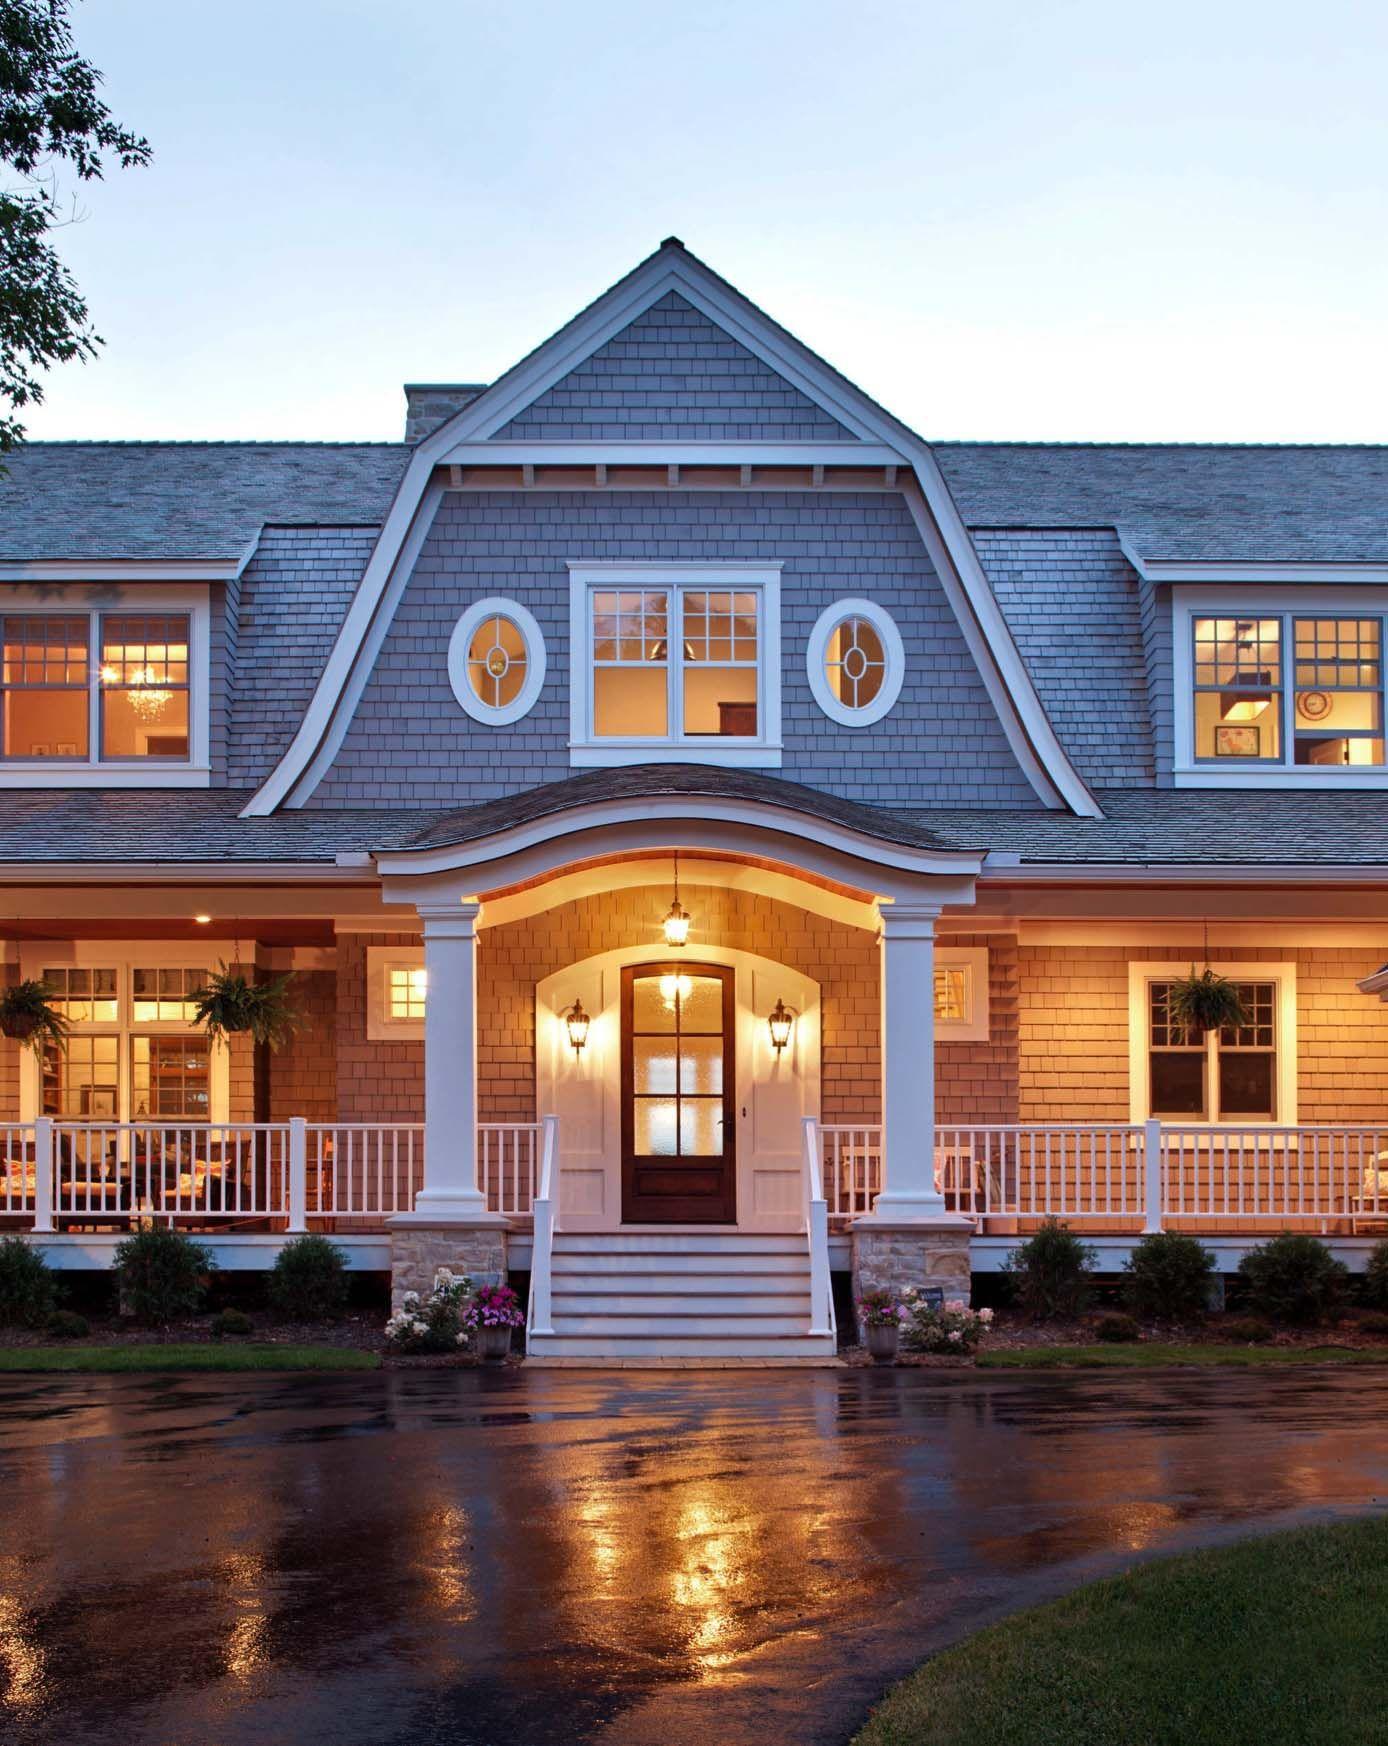 Tour A Dreamy Nantucket Style Home With A Farmhouse Twist In Minnesota Nantucket Style Homes House Designs Exterior Modern Farmhouse Exterior